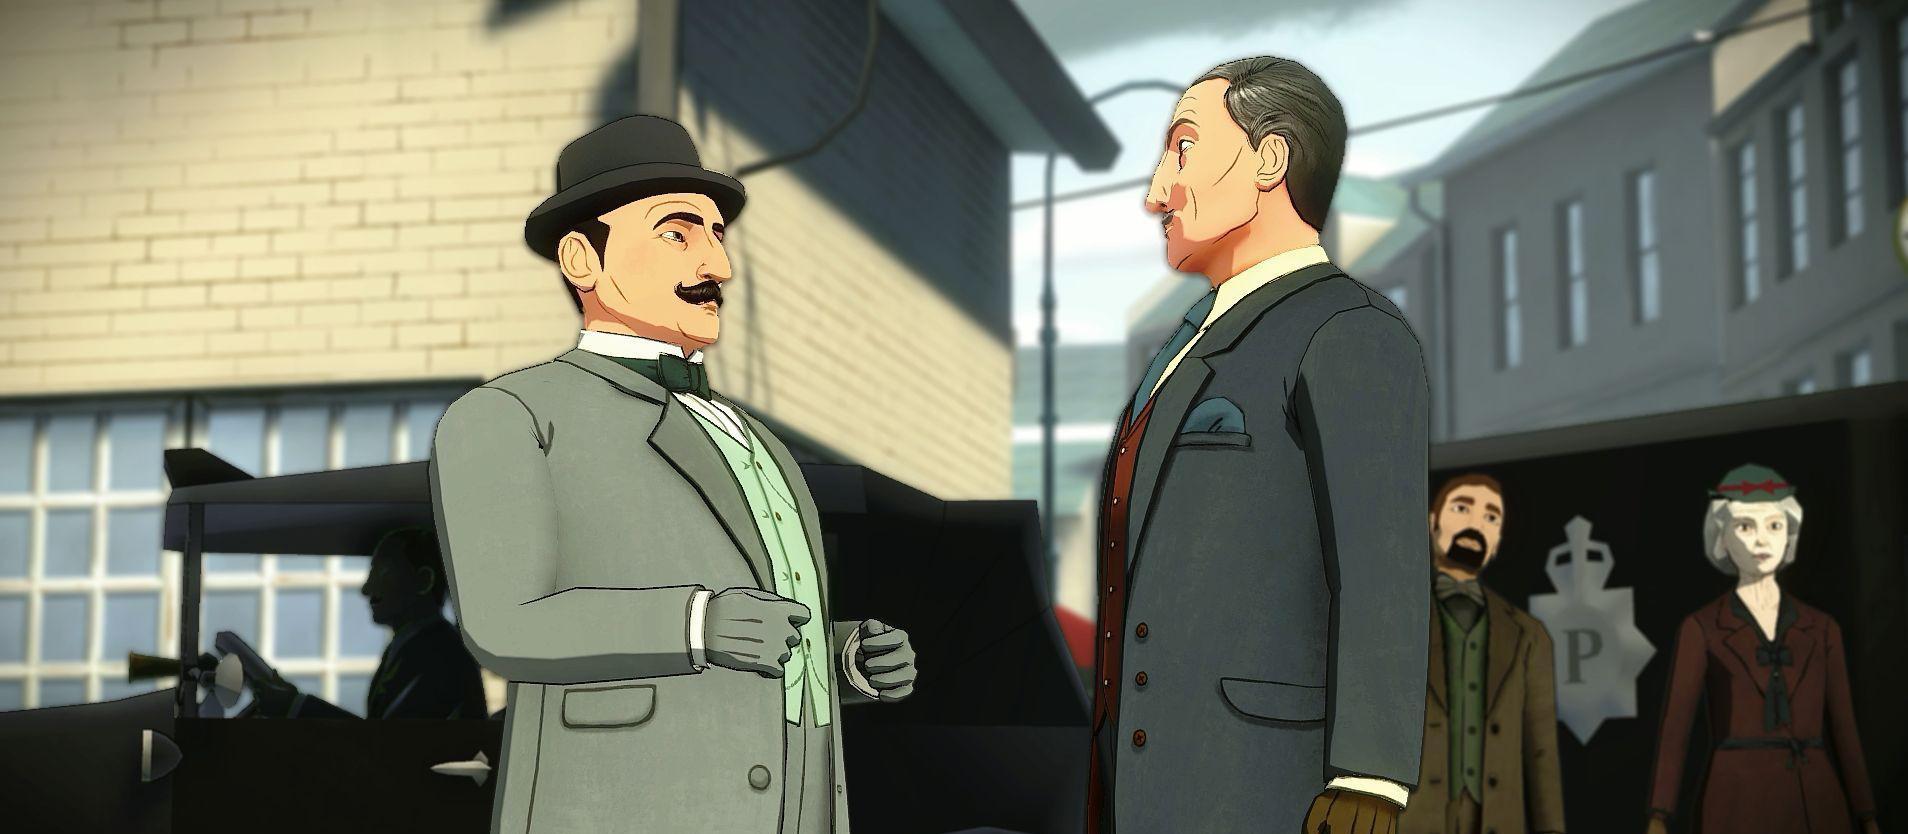 Poirot et Hatkins, son gars sûr